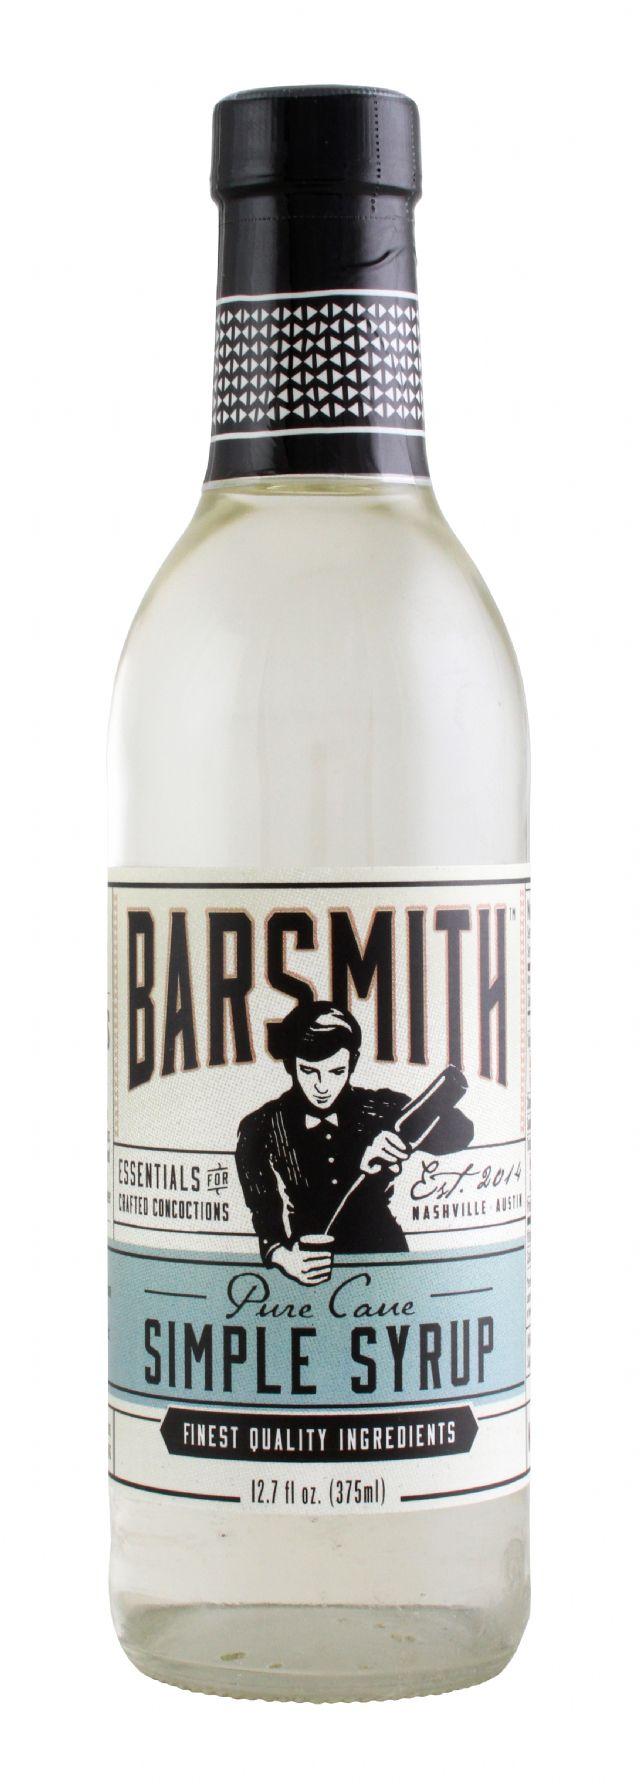 Barsmith: BarSmith SimpleSyrup Front